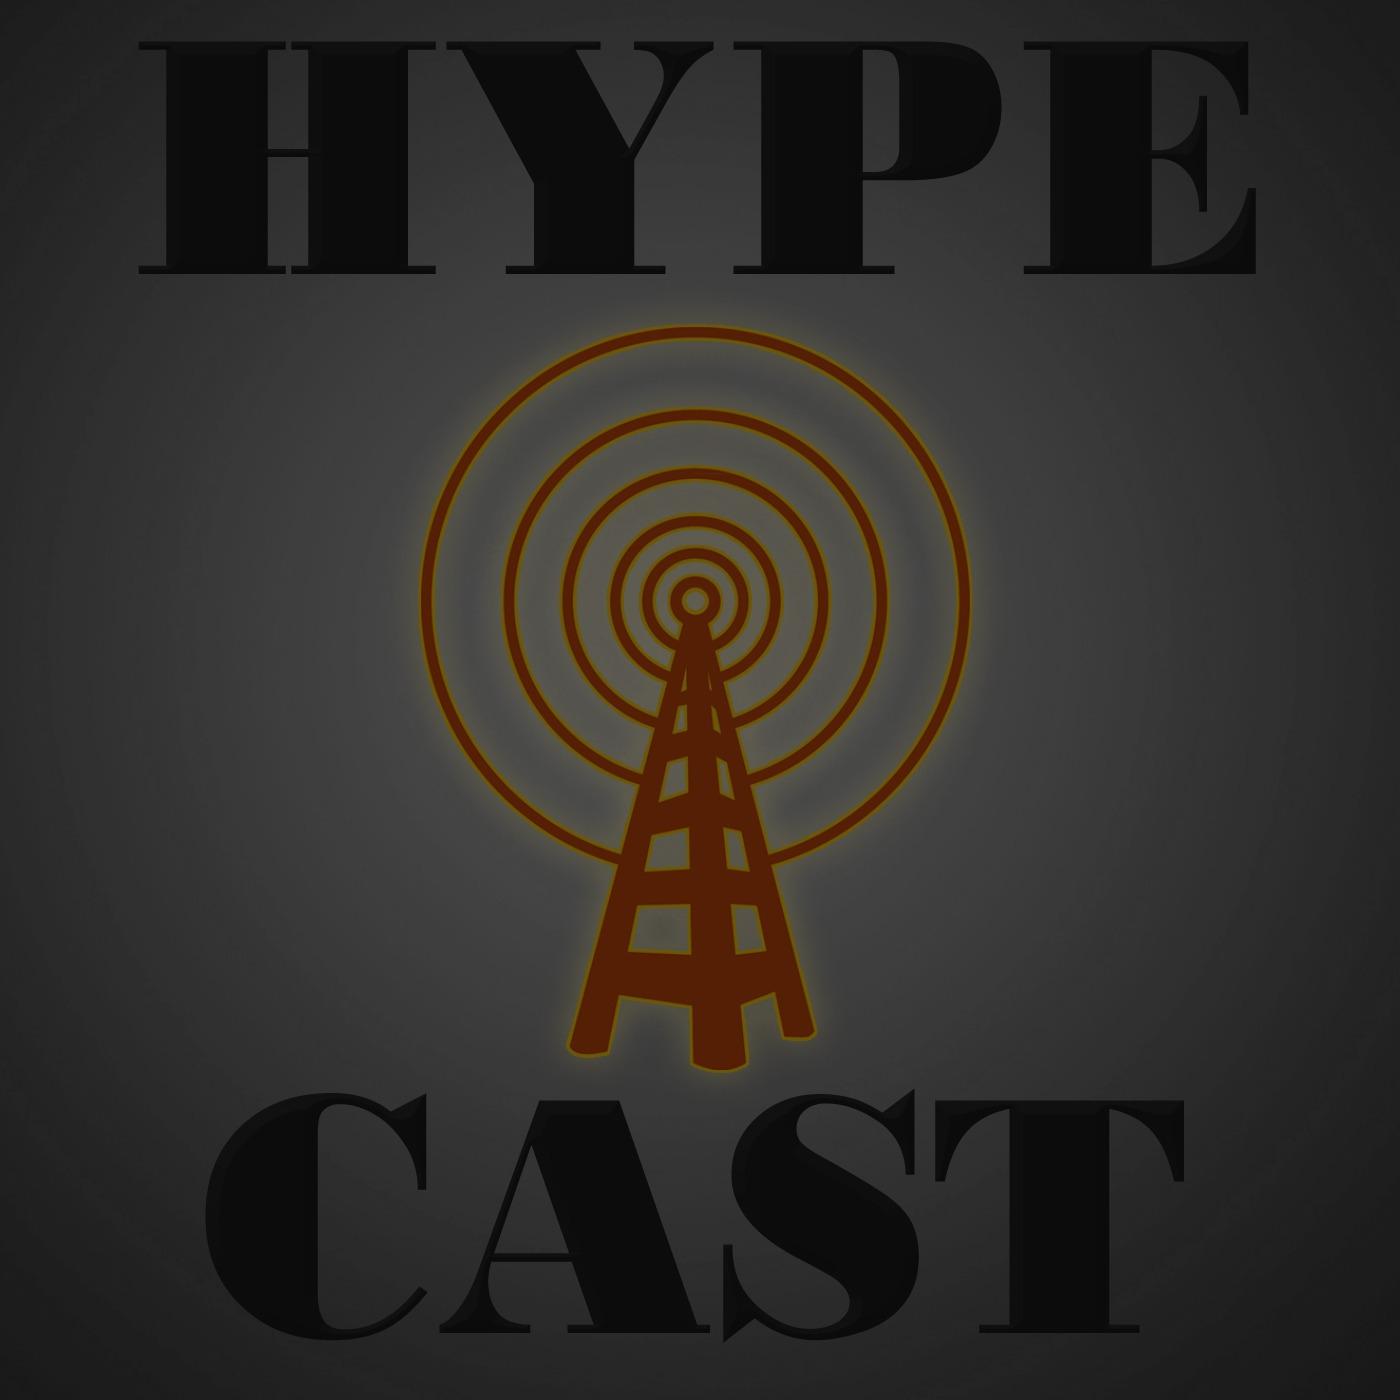 Hype Cast